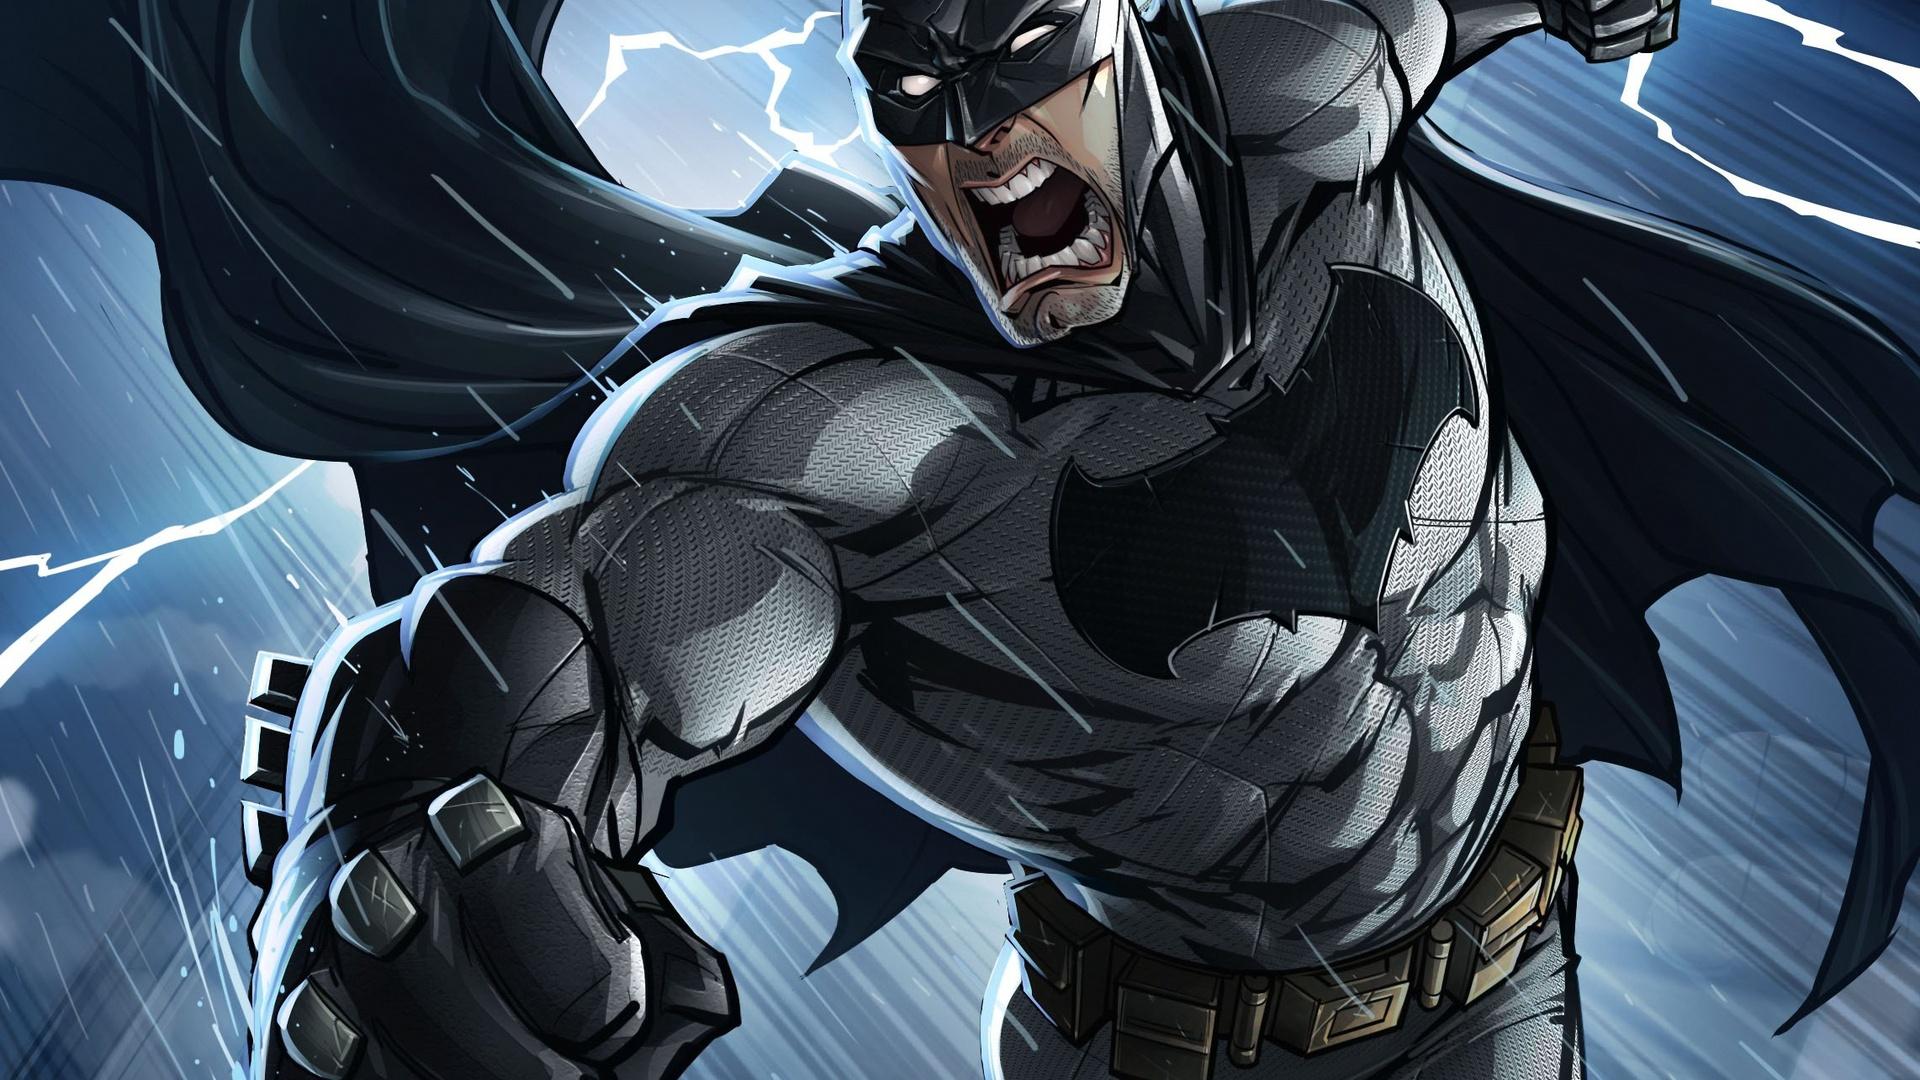 1920x1080 Batman Comics Art Laptop Full HD 1080P HD 4k ...